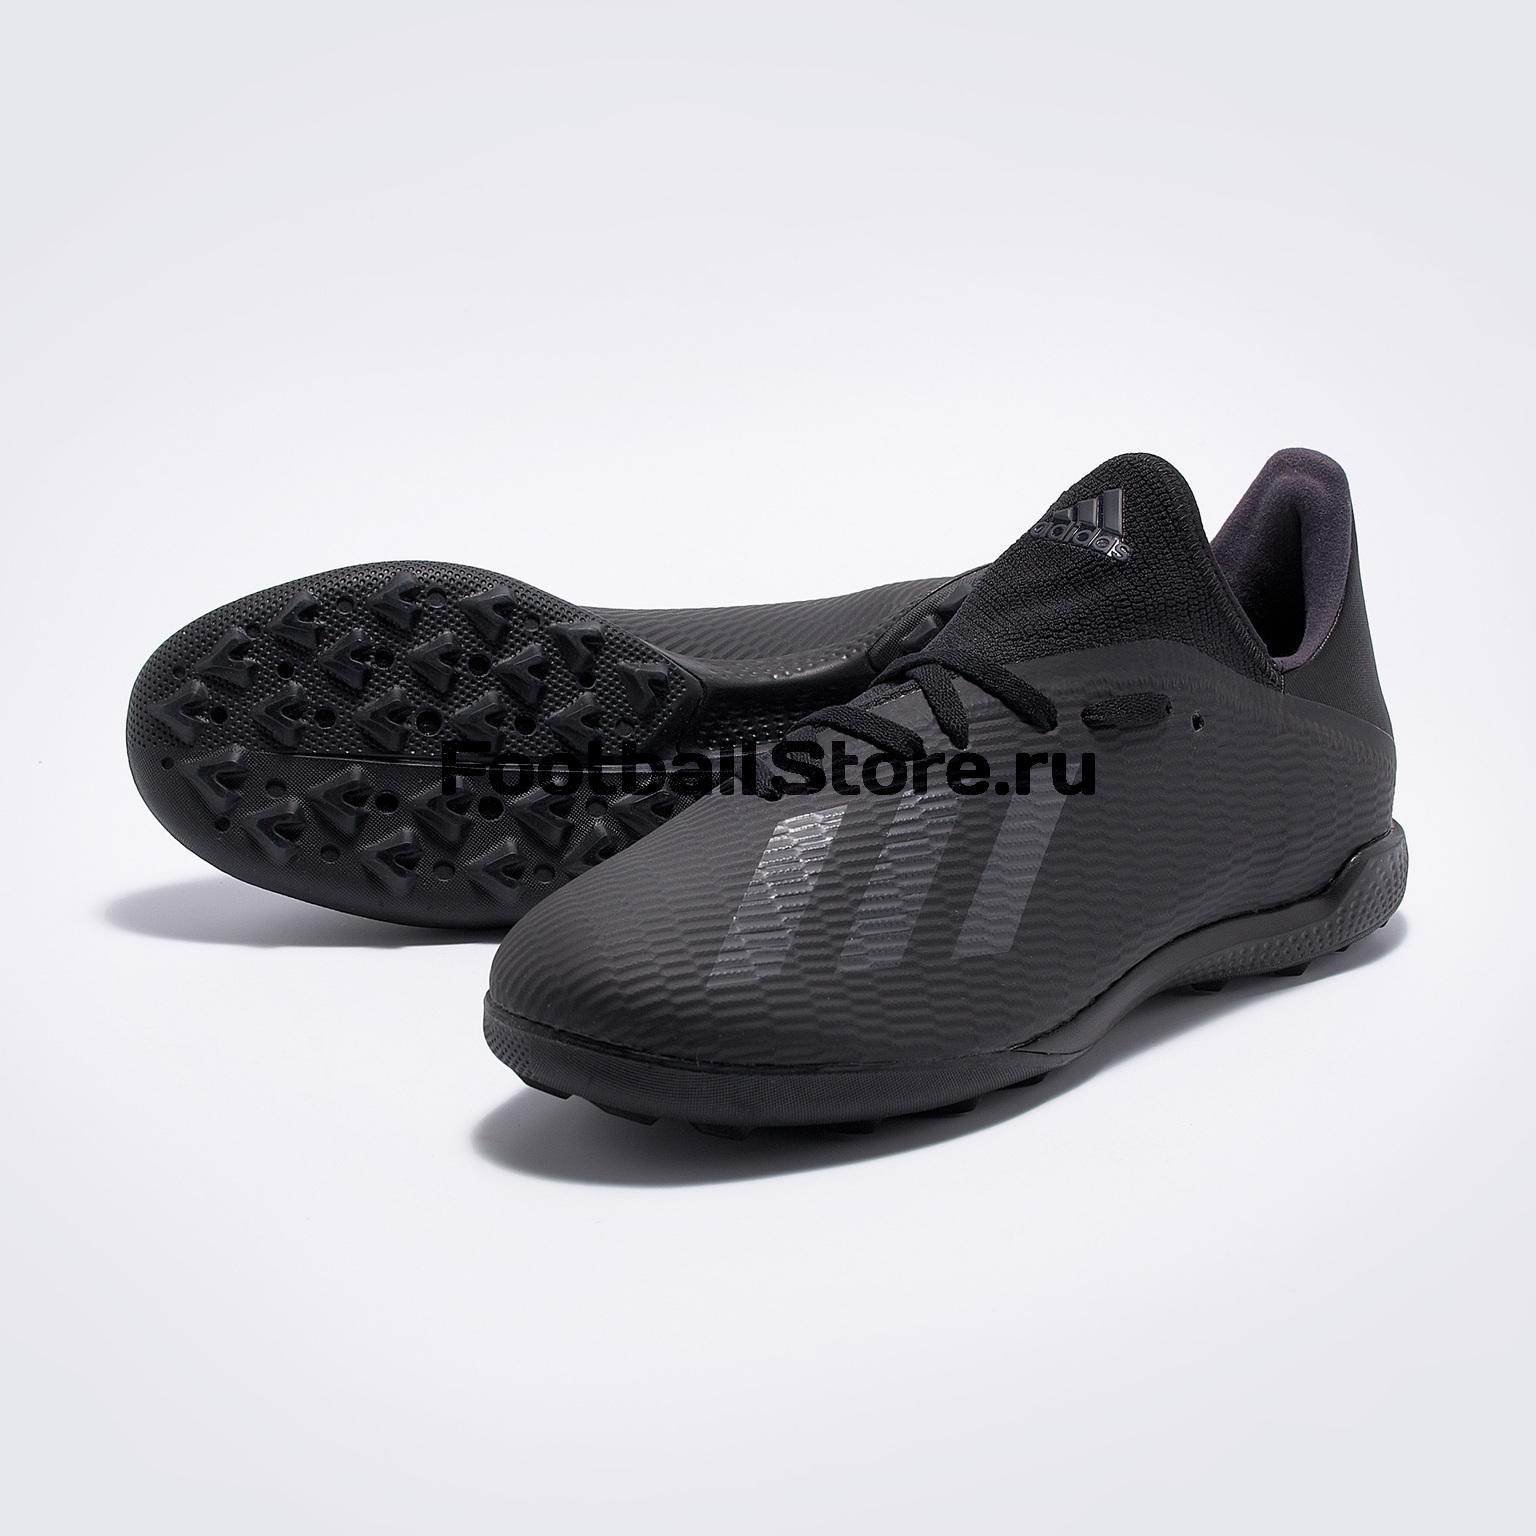 Шиповки Adidas X 19.3 TF F35373 шиповки детские adidas x tango 18 3 tf db2422